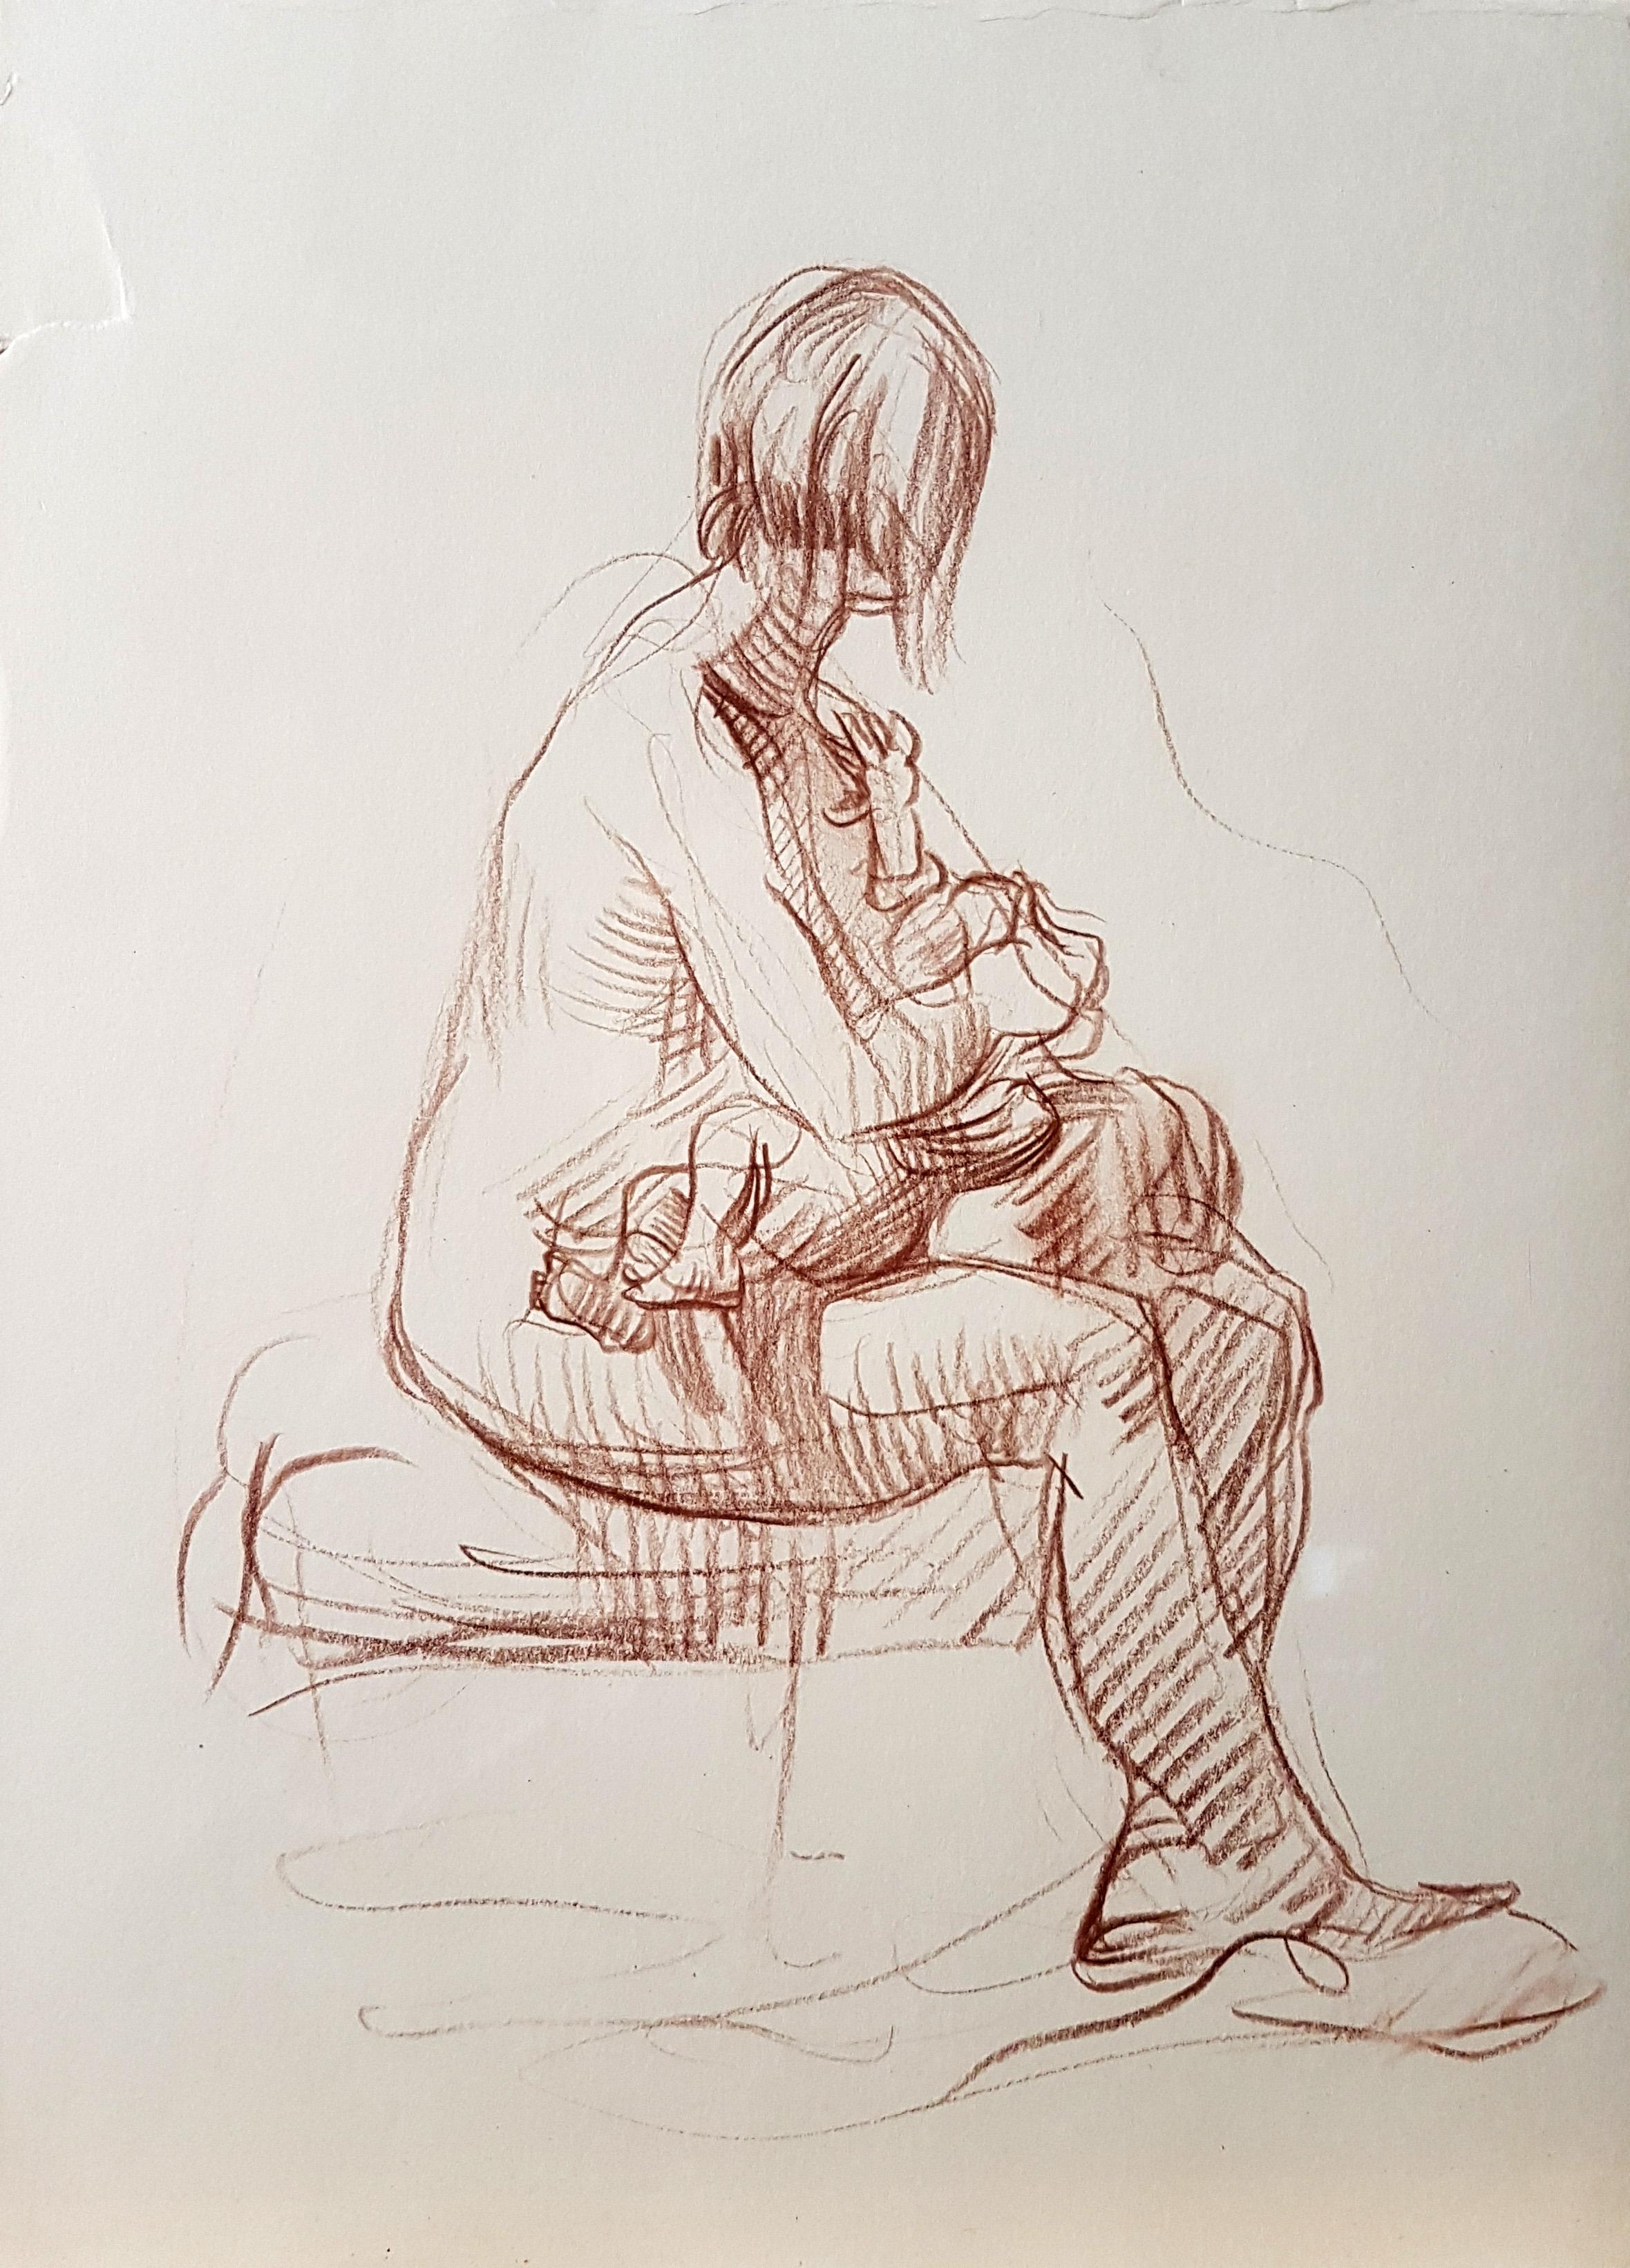 Brestfeeding mother 2016